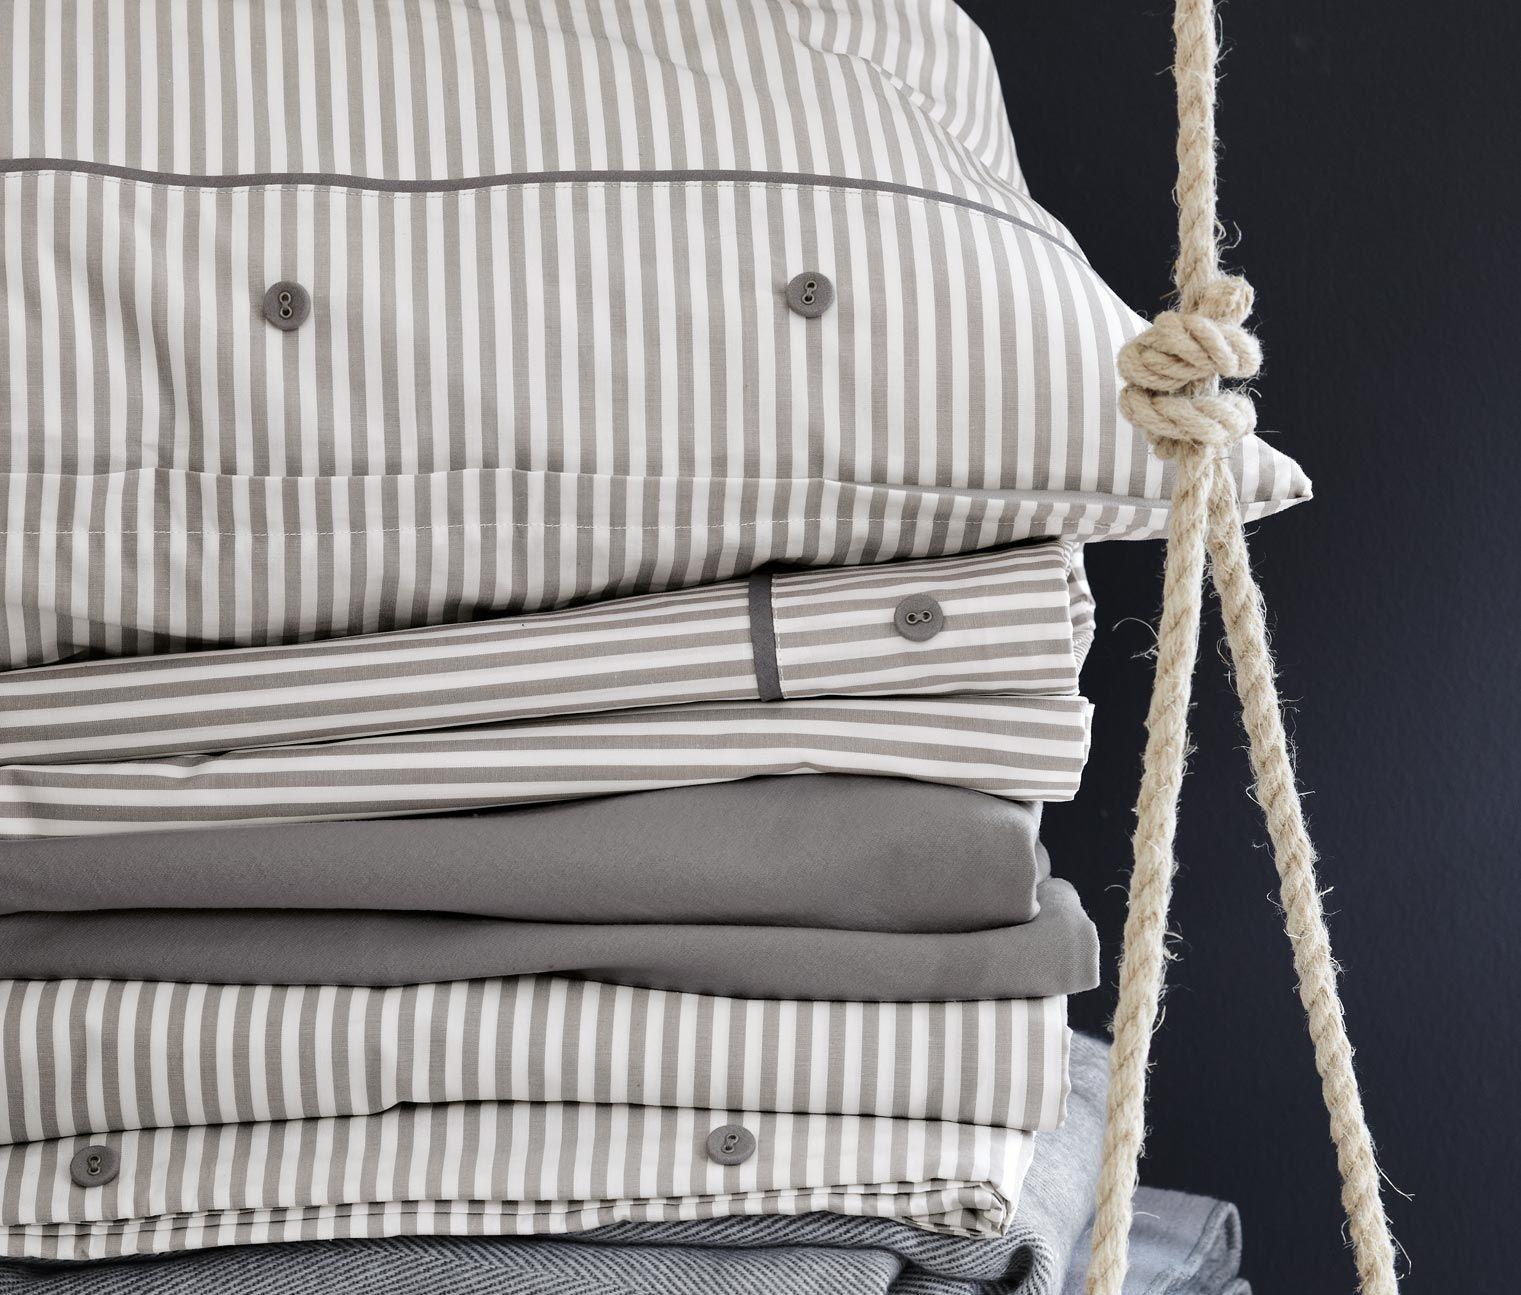 perkal bettw sche tchibo grau gestreift stripes 34 95 buy home. Black Bedroom Furniture Sets. Home Design Ideas